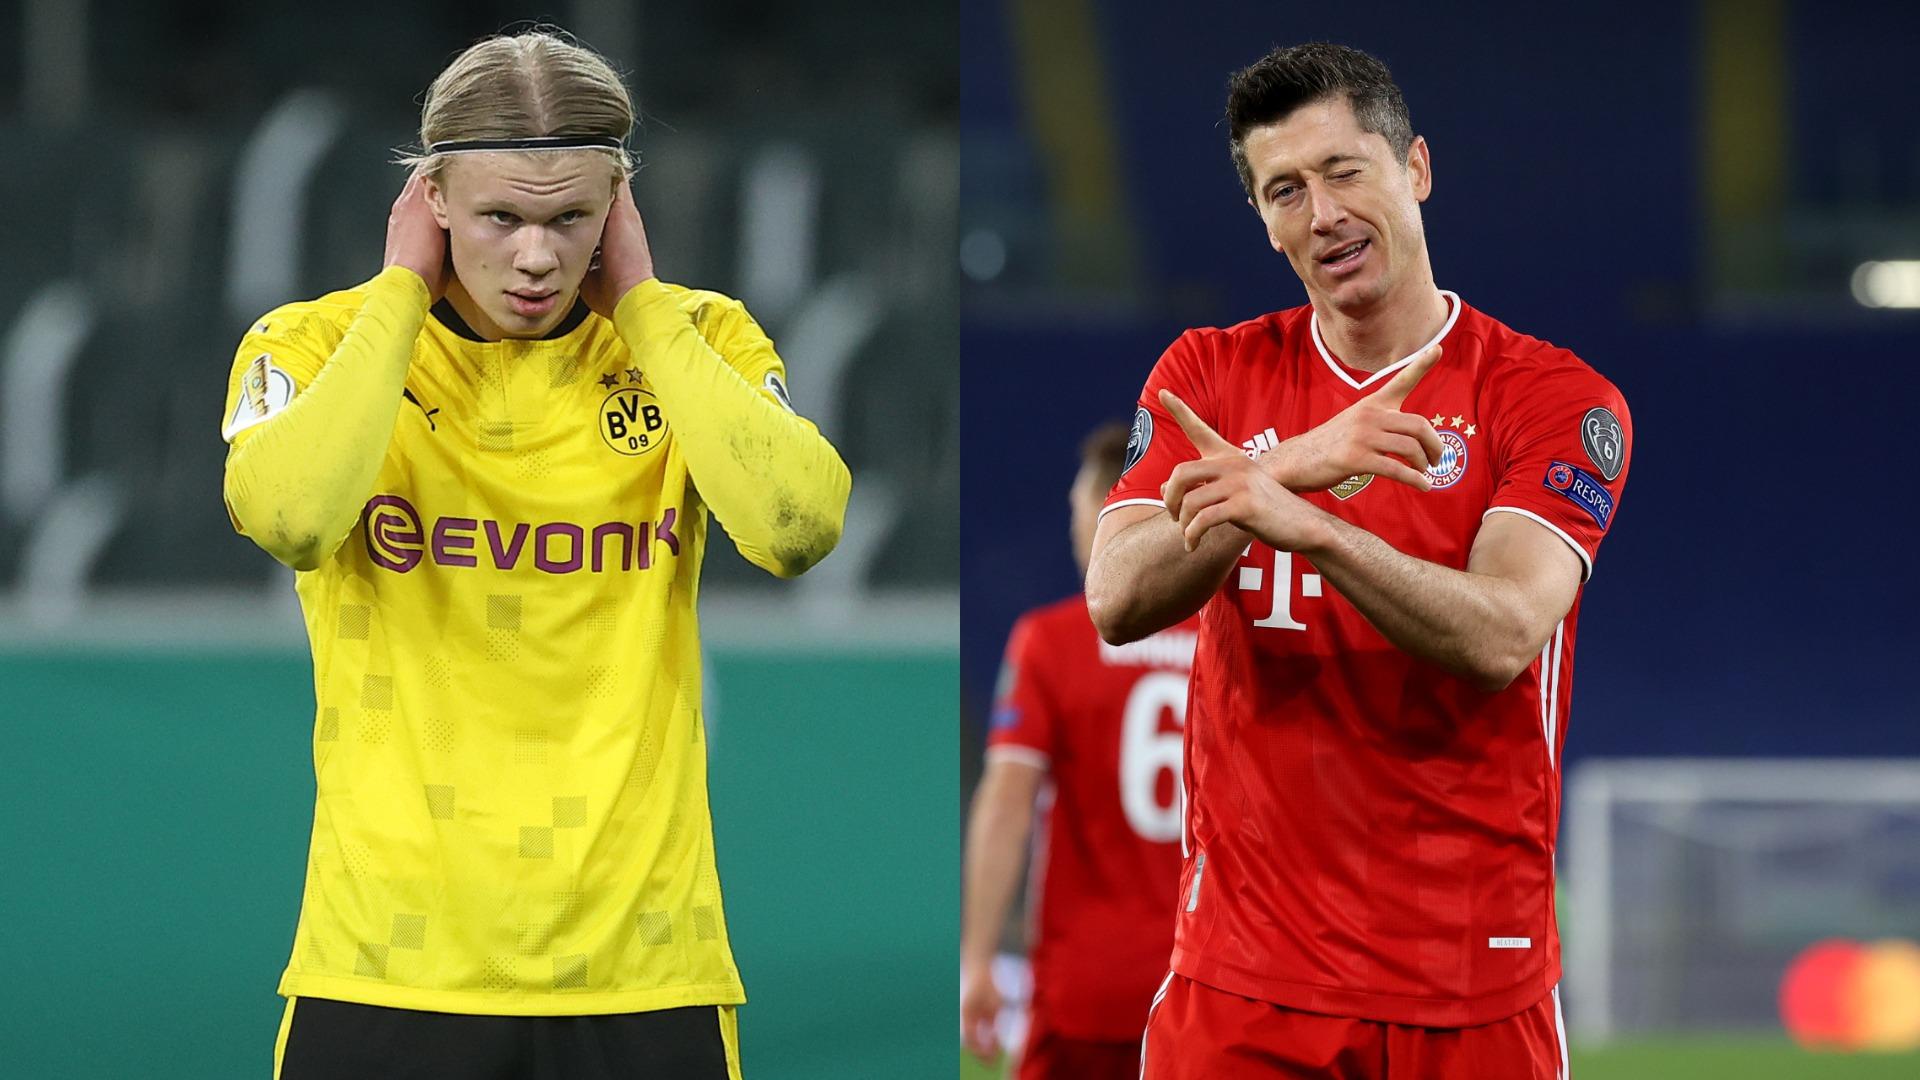 Der Klassiker: Is Haaland already better than Lewandowski?